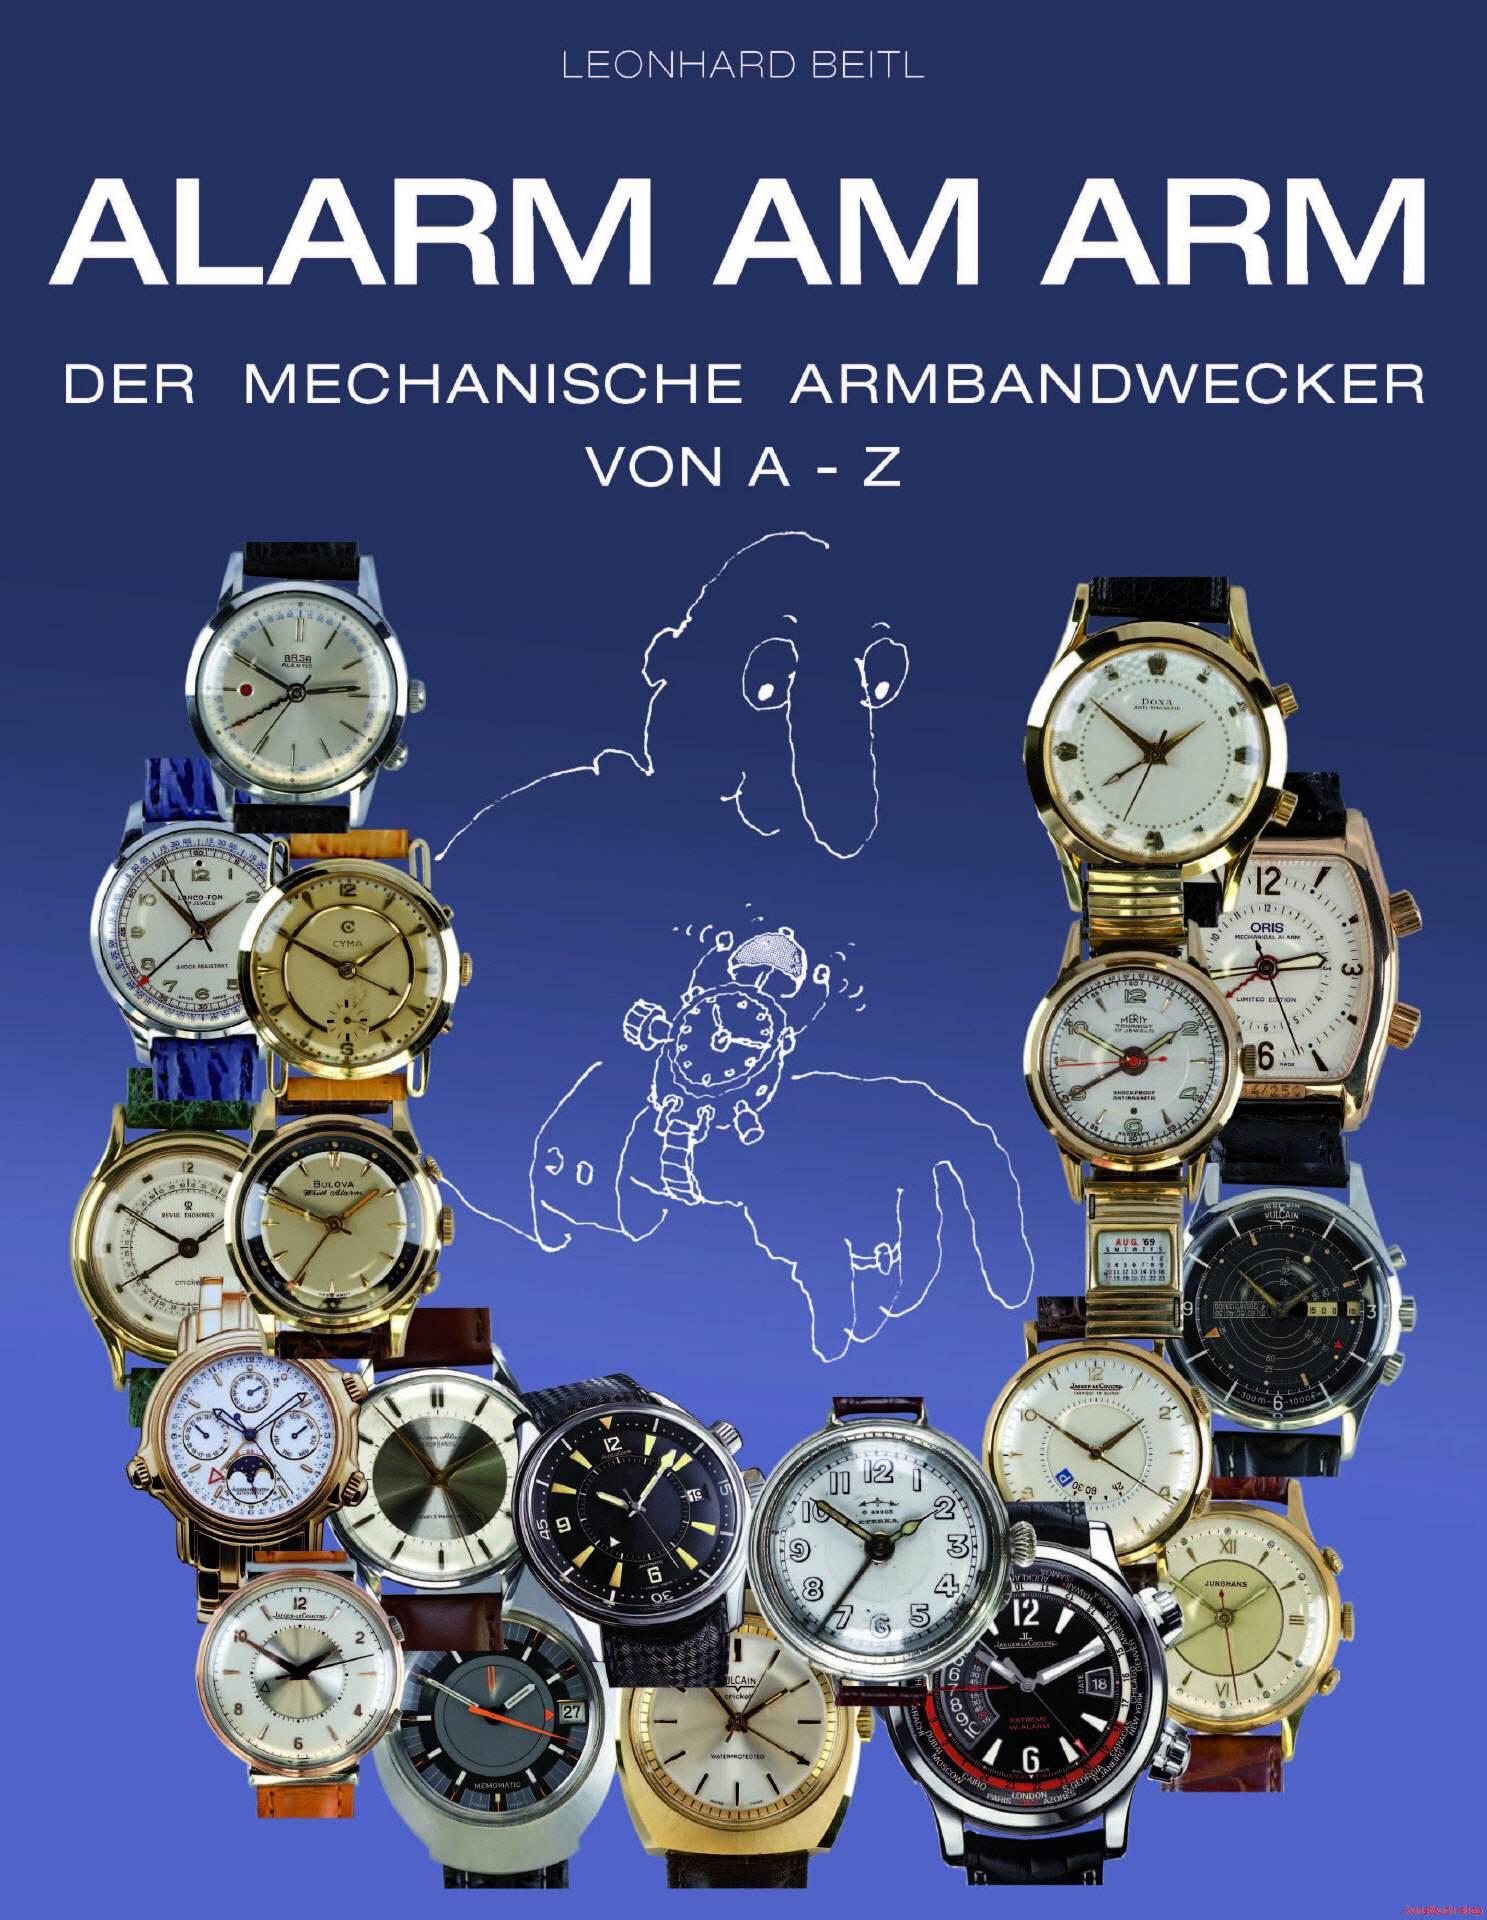 Alarm am Arm